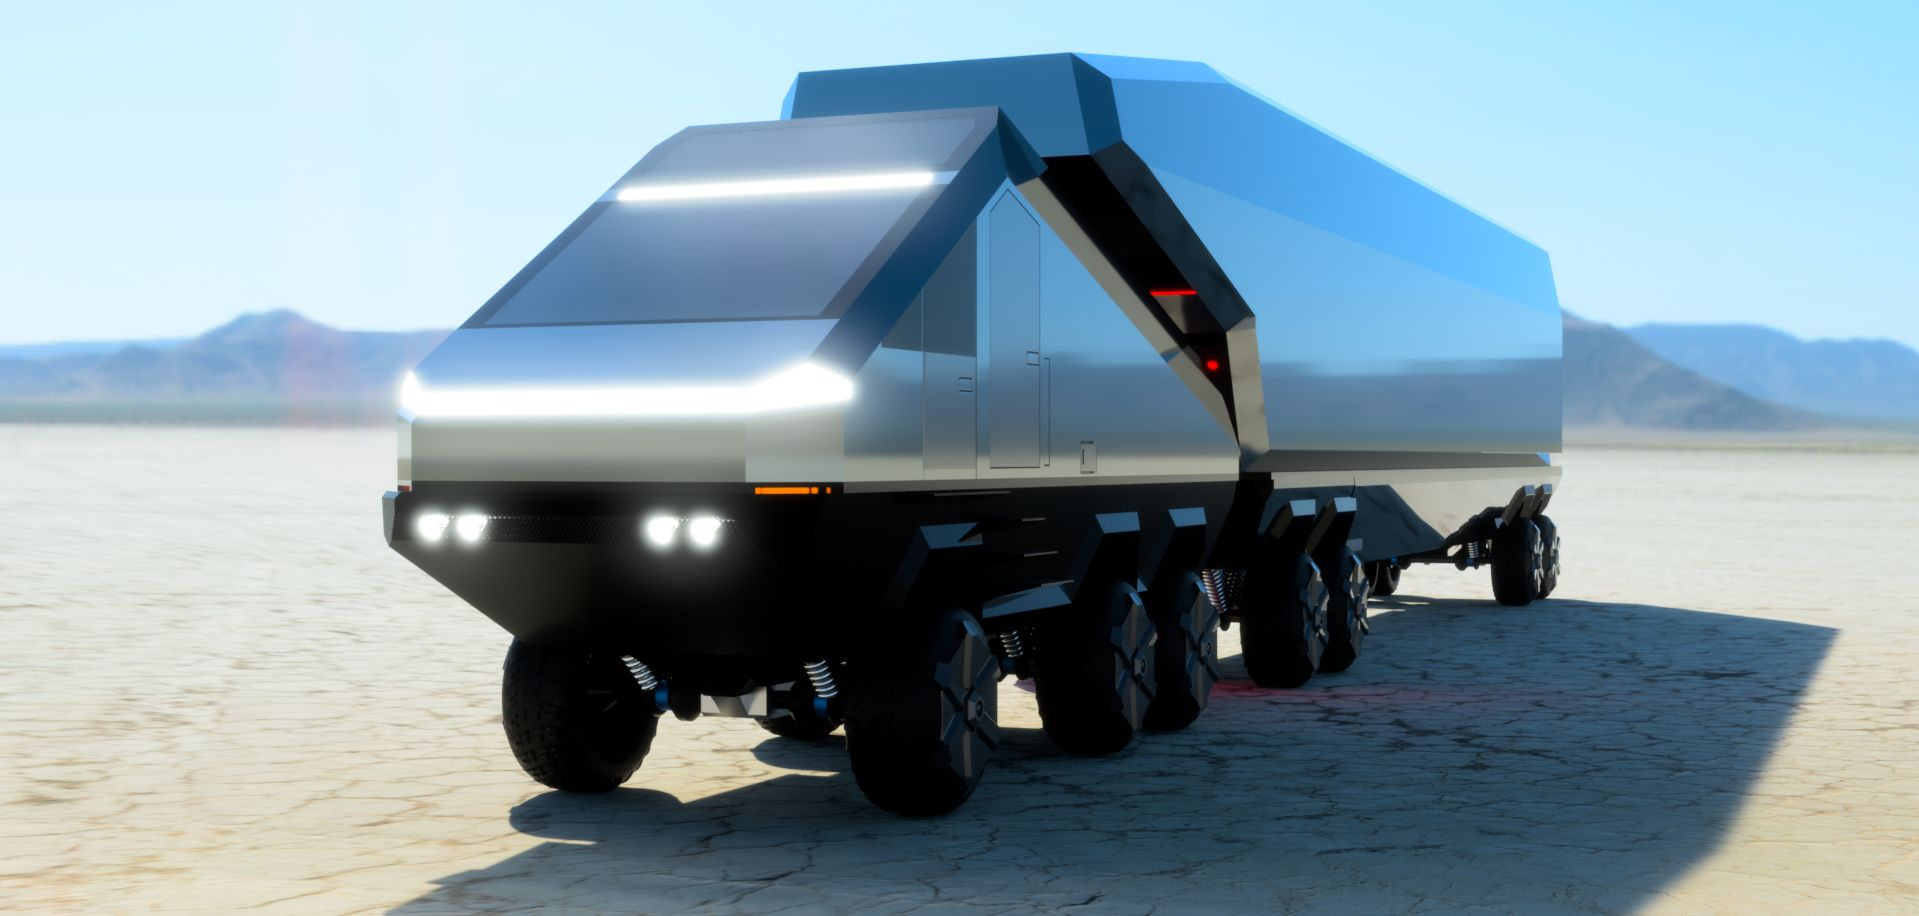 Tesla-cybervan-2020-apr-14-03-30-20am-000-customizedview2818970621-png-3500-3500